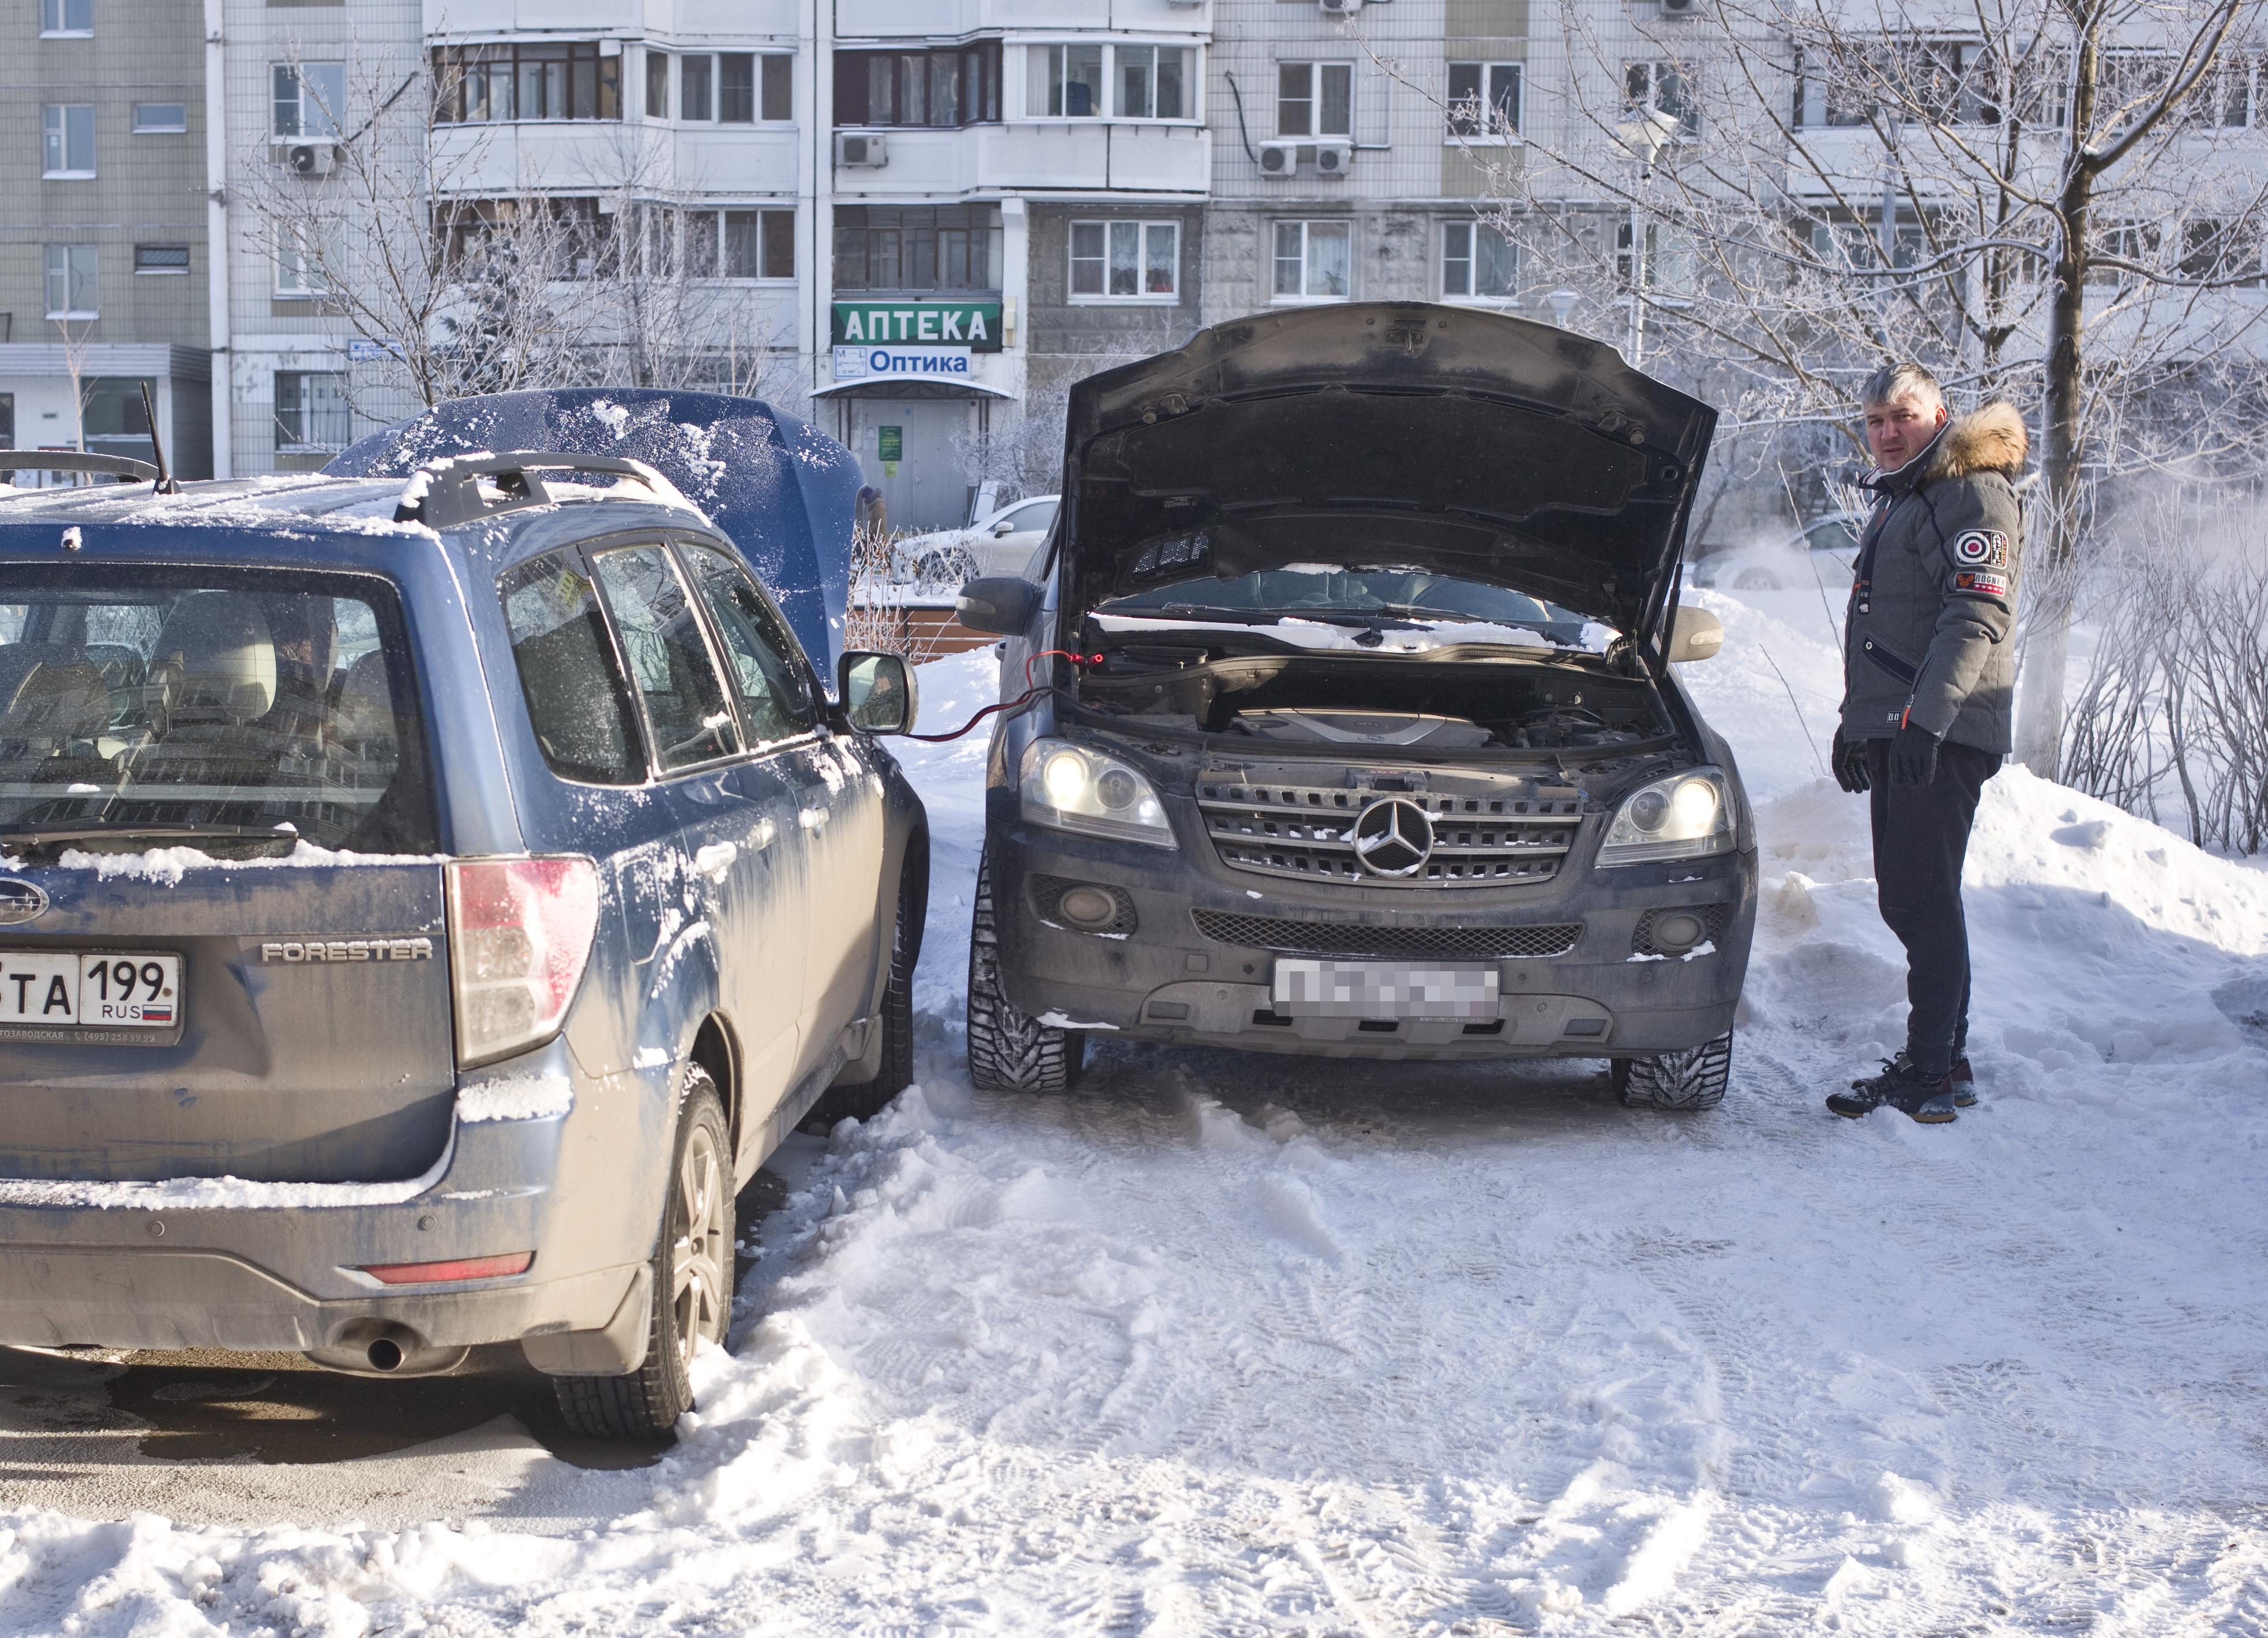 Фото © РИА Новости / Сергей Пятаков